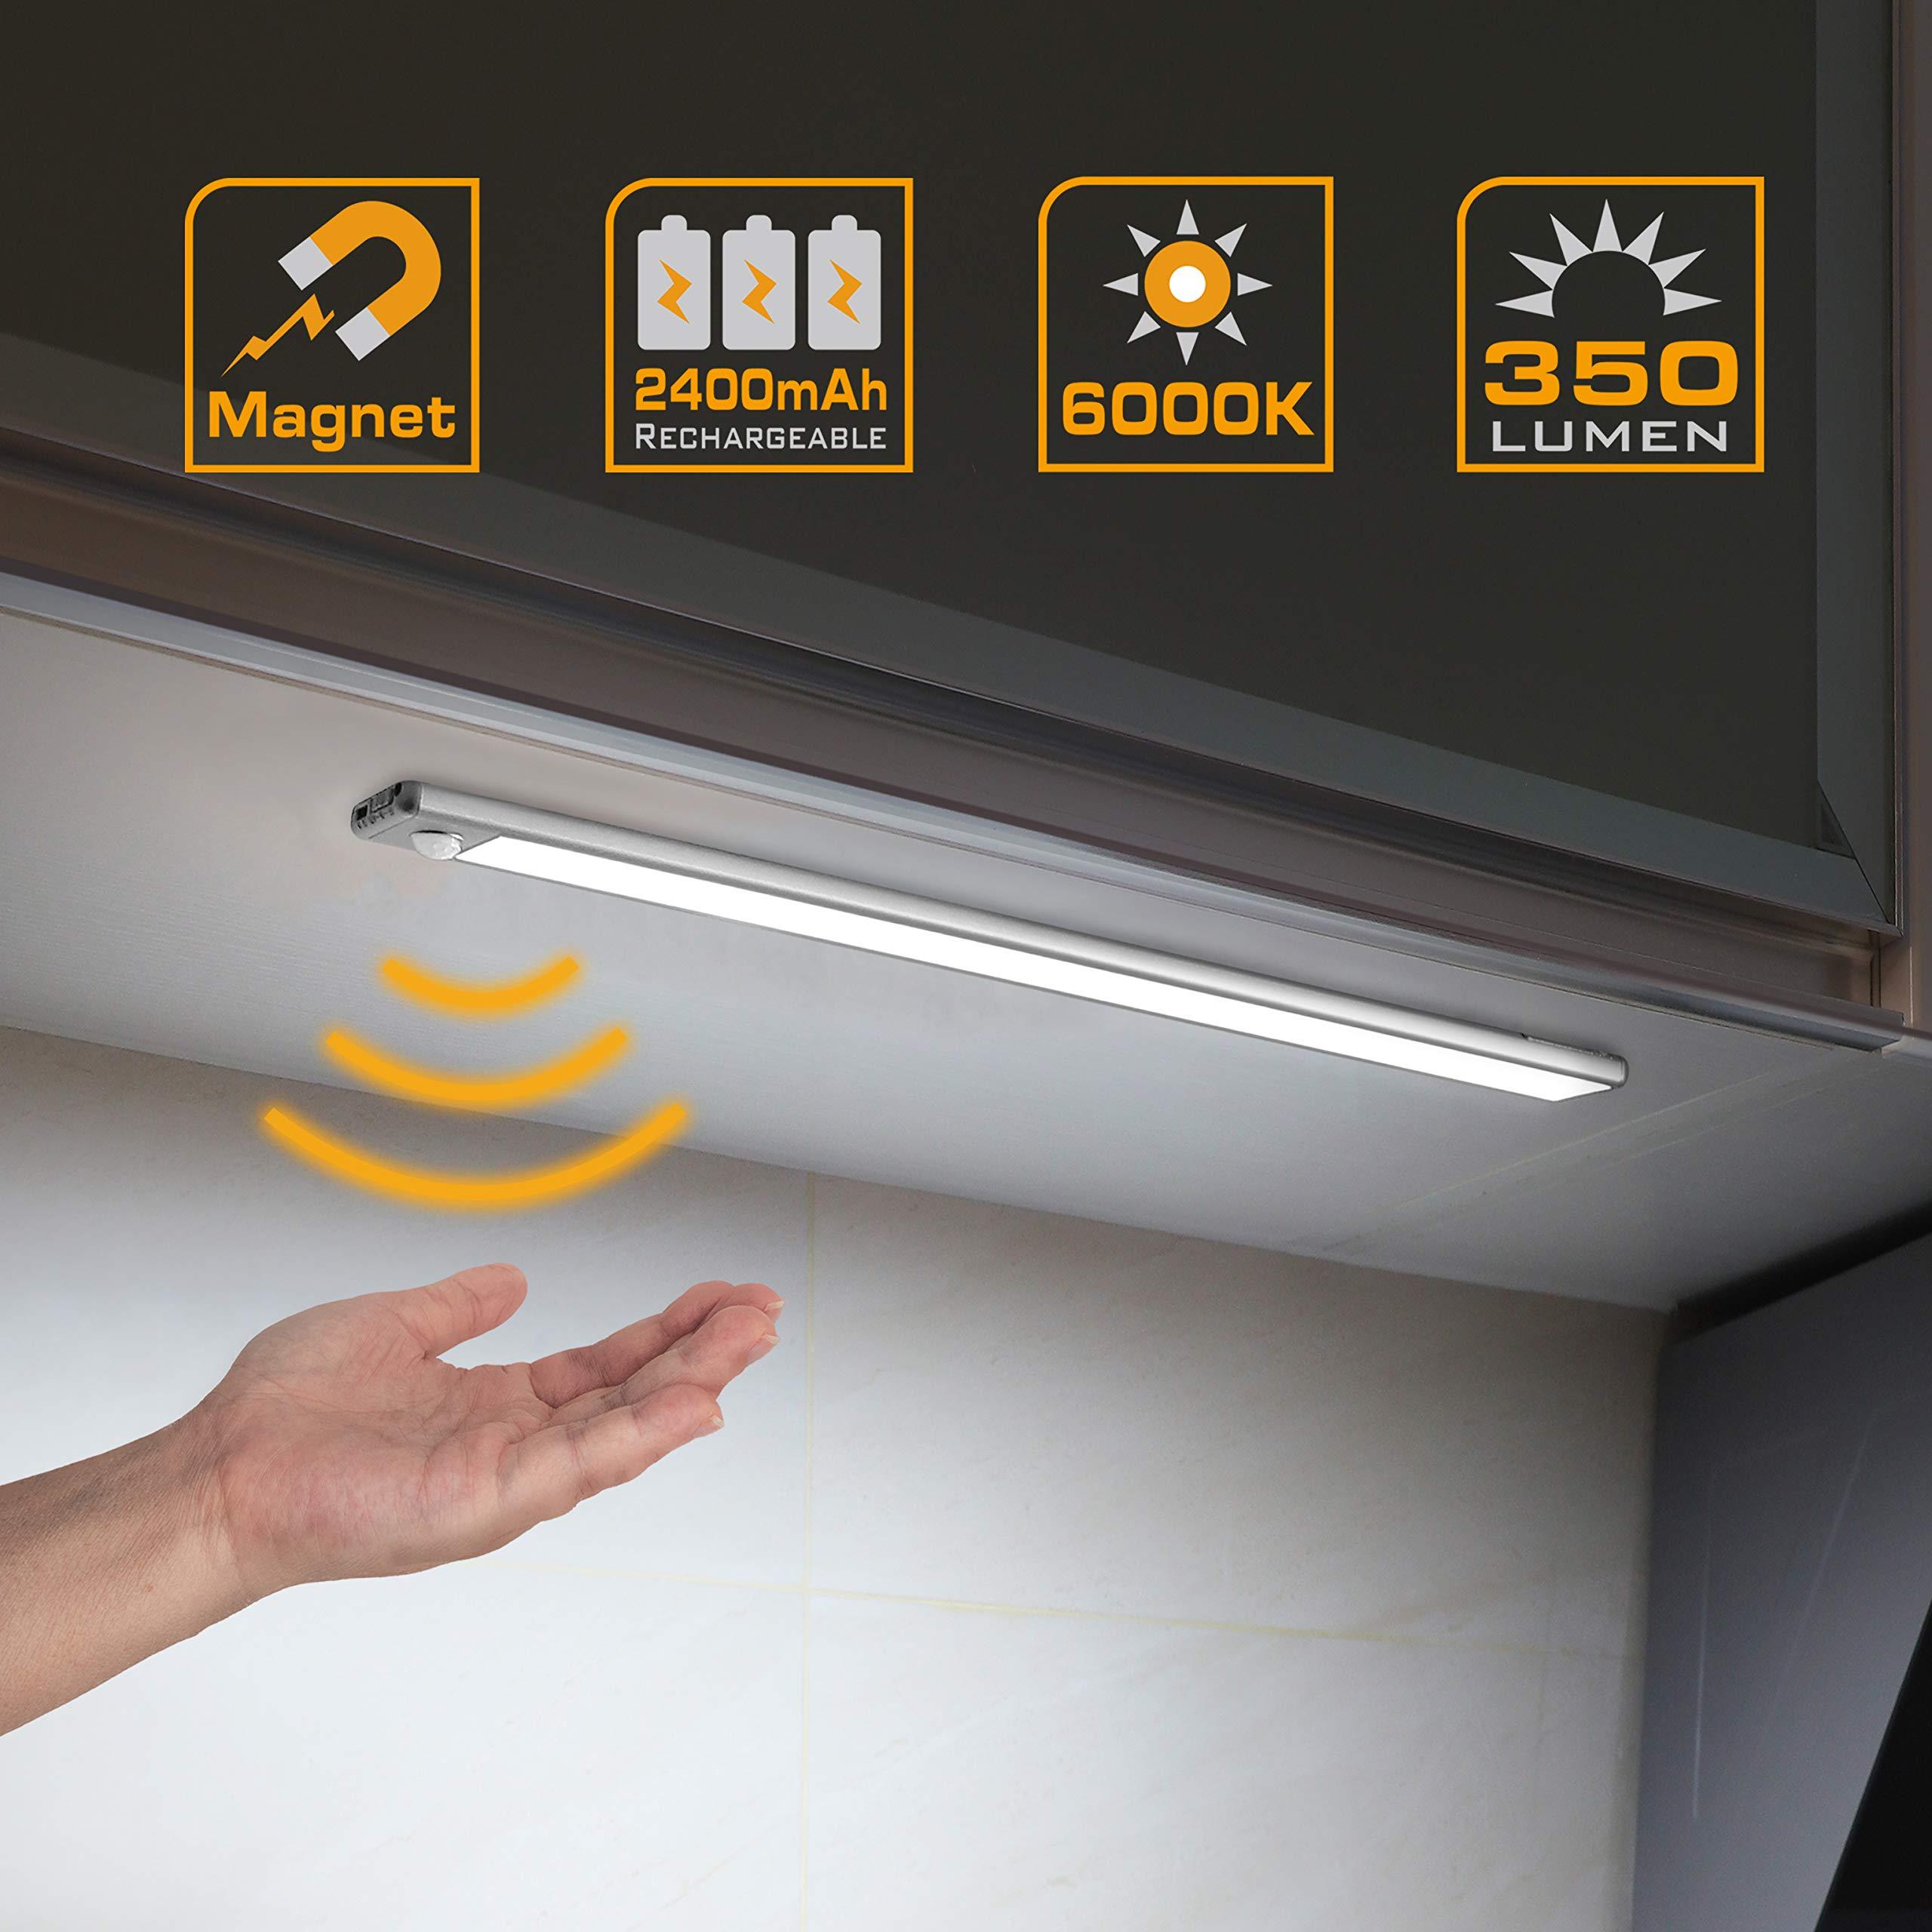 EverBrite Under Cabinet Lighting, 70 LED Under Counter Lighting, Wireless Motion Sensor Light, Ultra Thin LED Light Bar for Closet, Cabinet and Hallway, 350 Lumen, 6000K